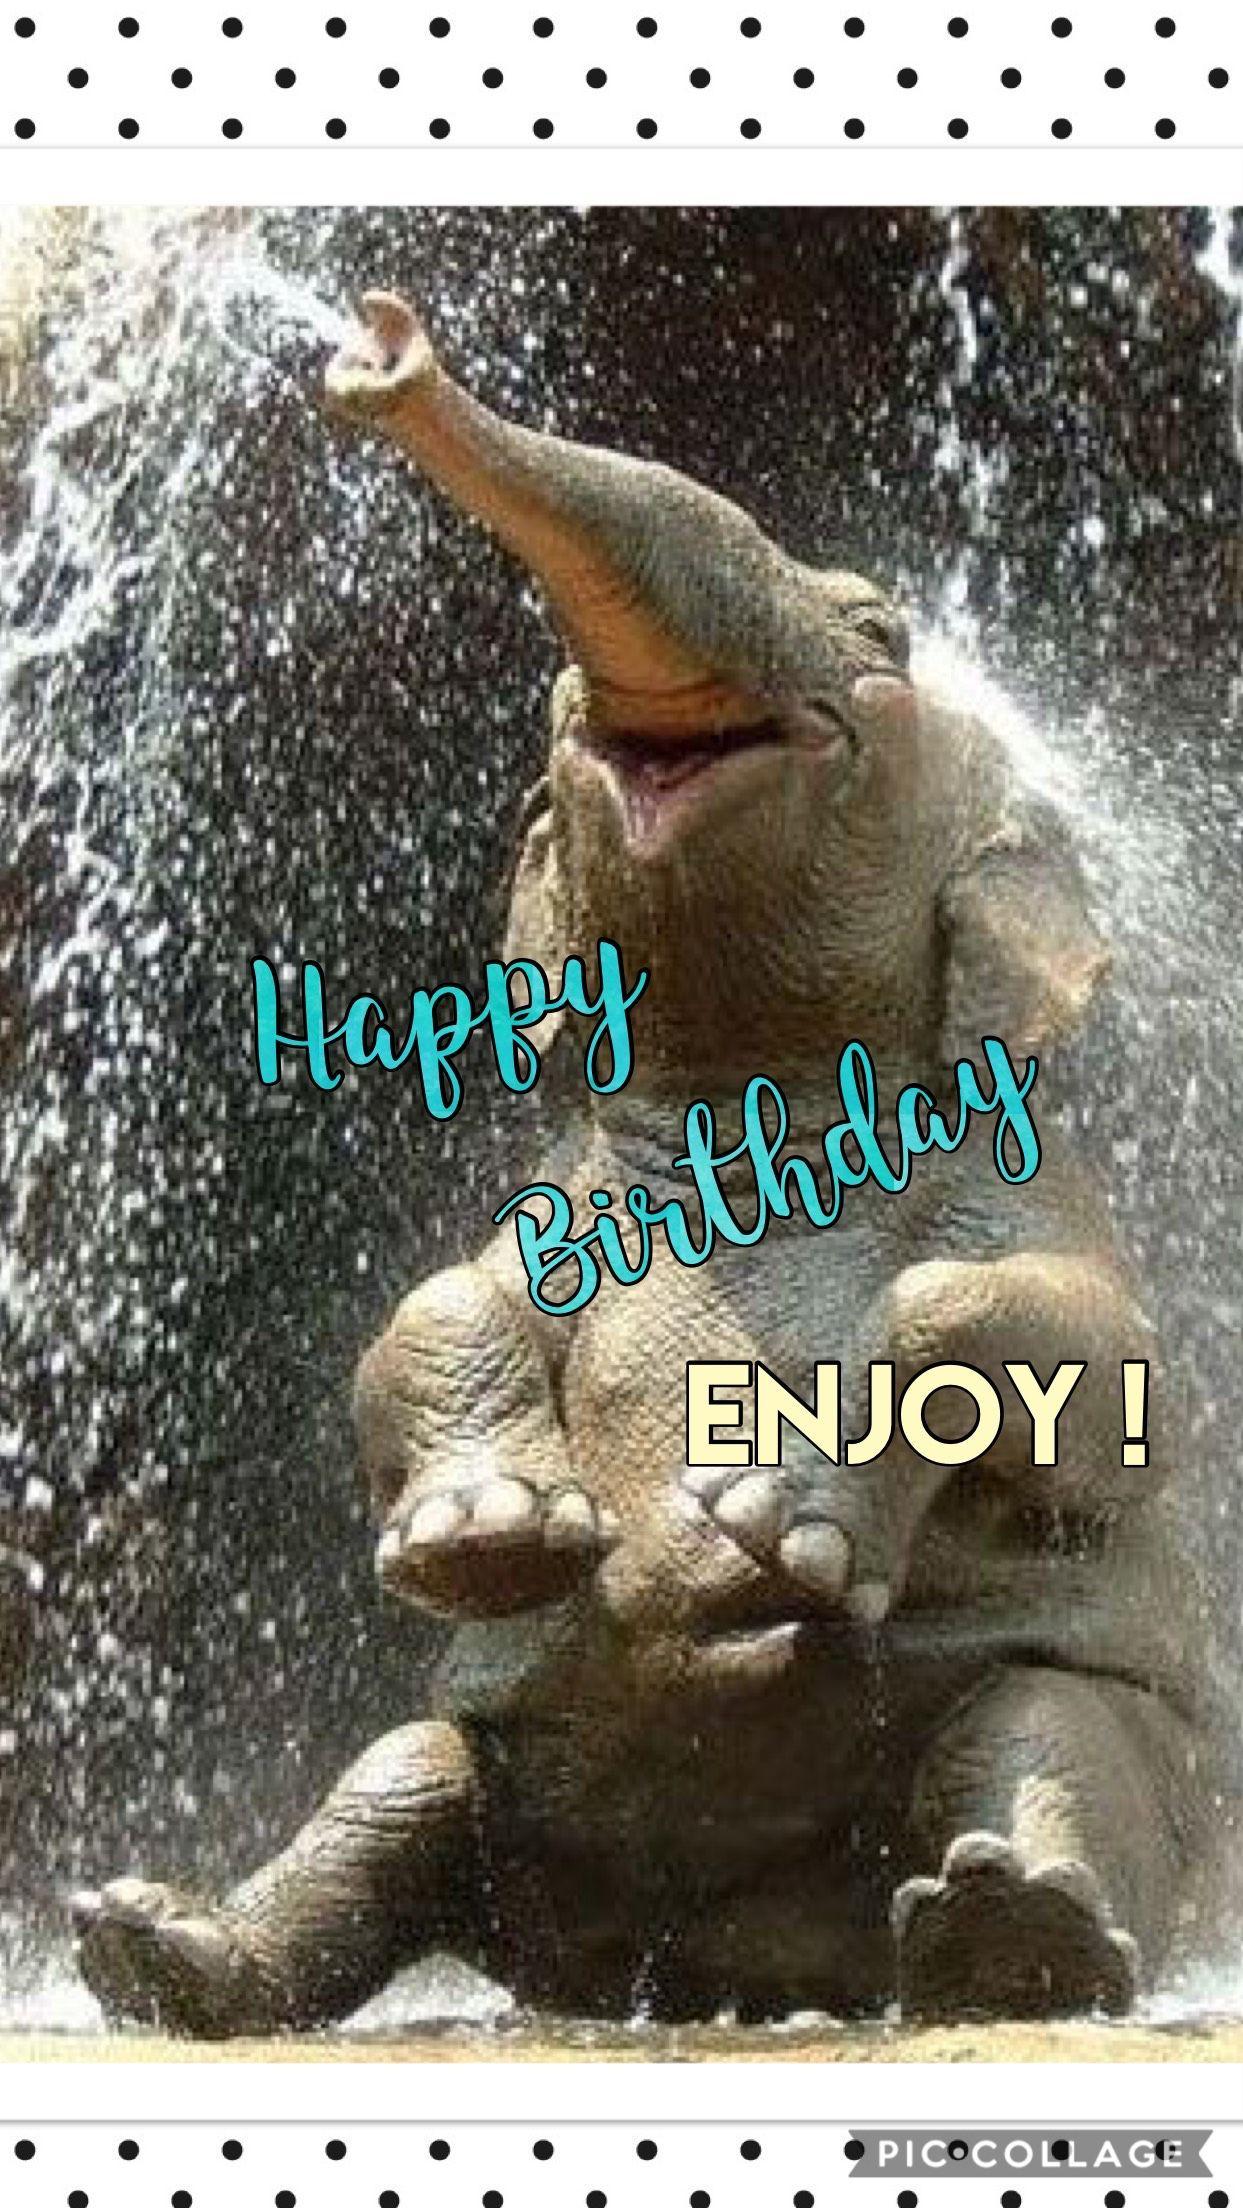 Happy Birthday Birthday Greetings Funny Funny Happy Birthday Wishes Happy Birthday Brother